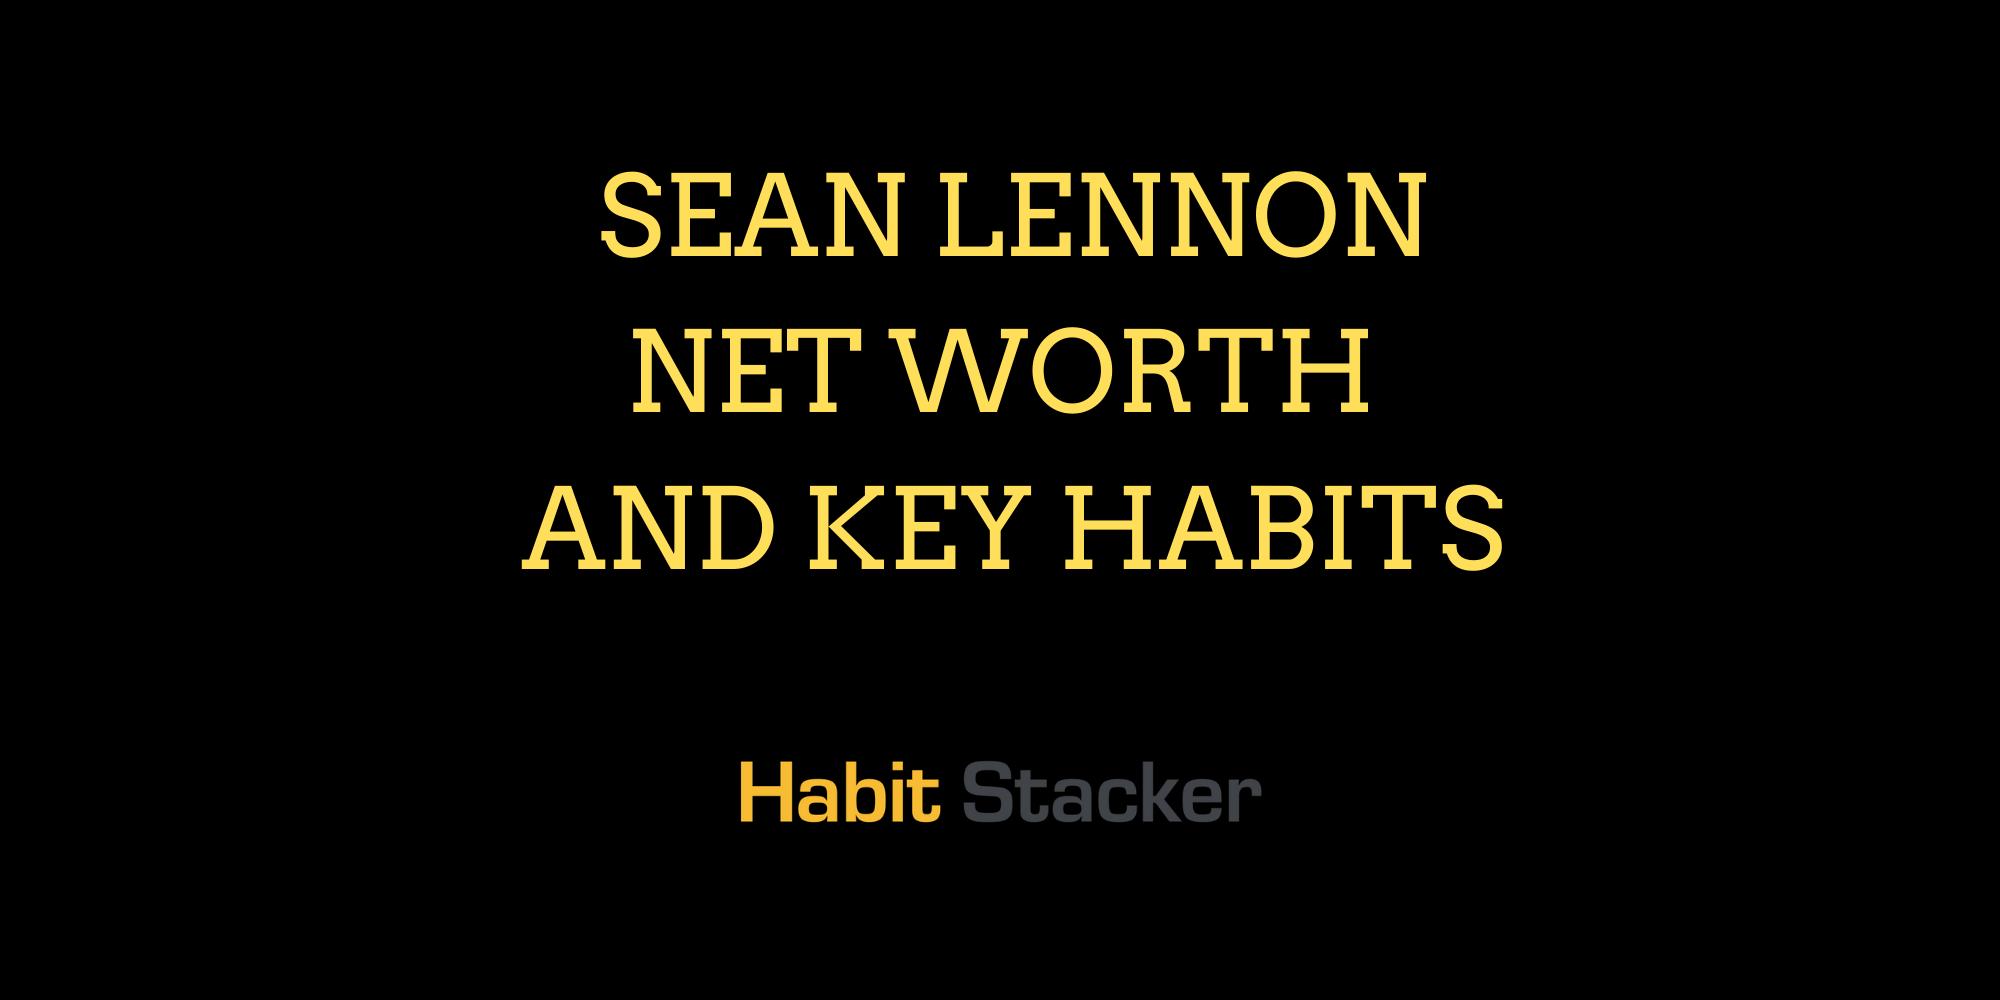 Sean Lennon Net Worth